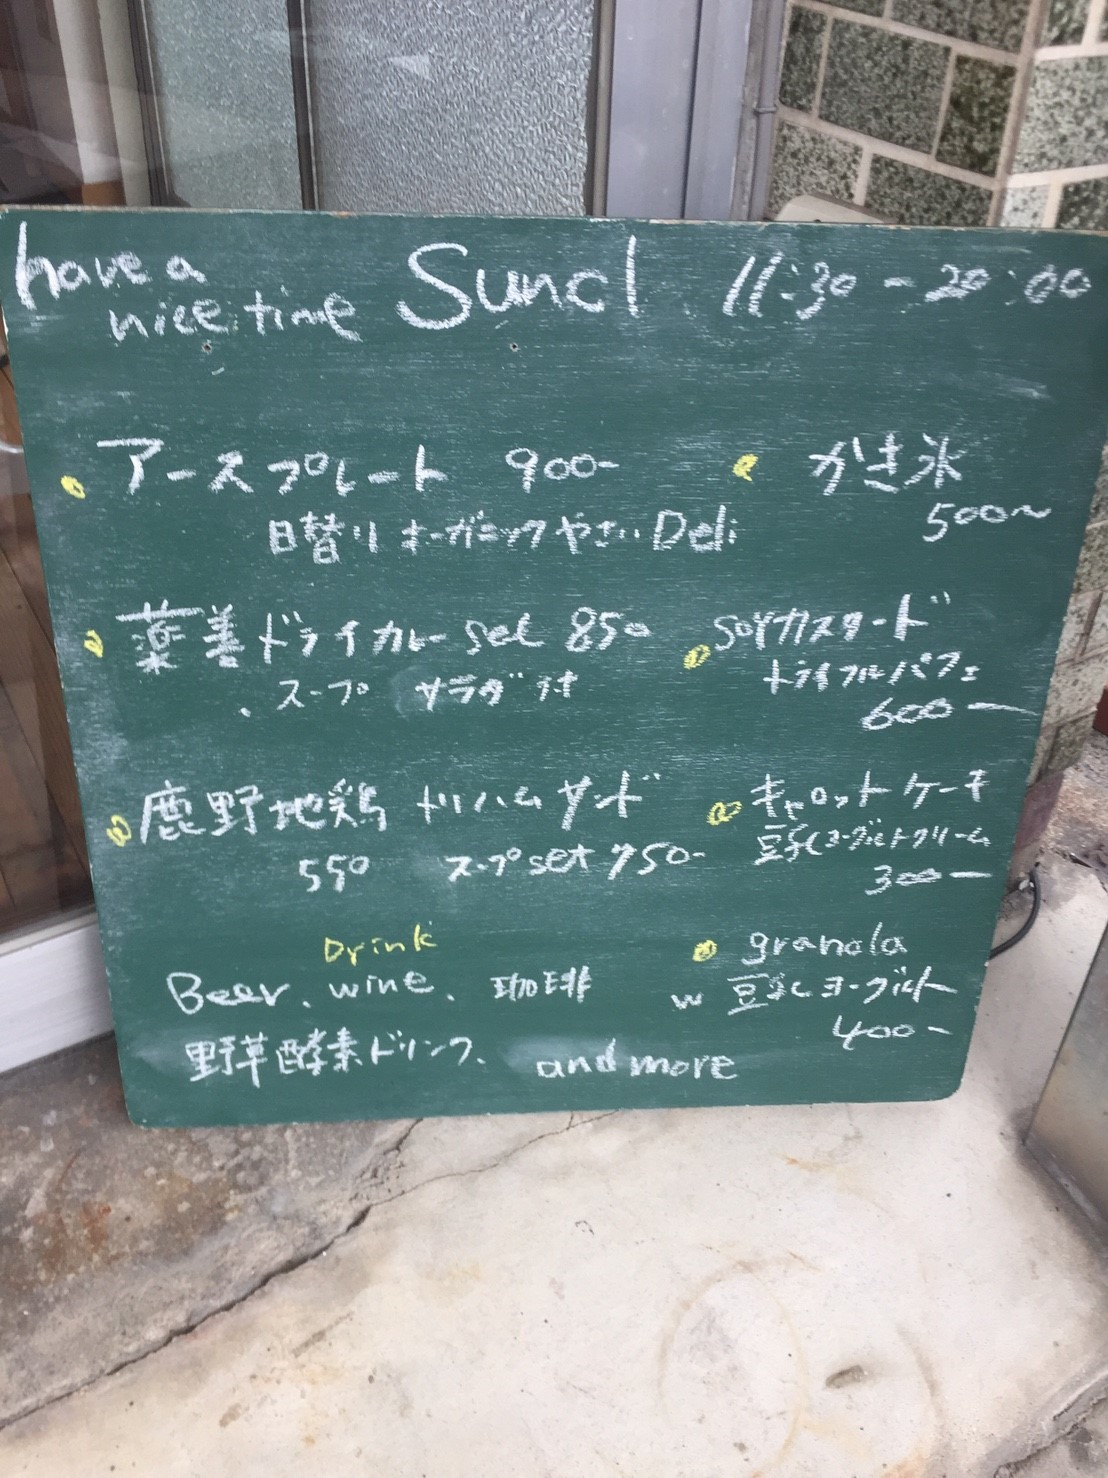 tottoriカルマ suncl_e0115904_08114228.jpg